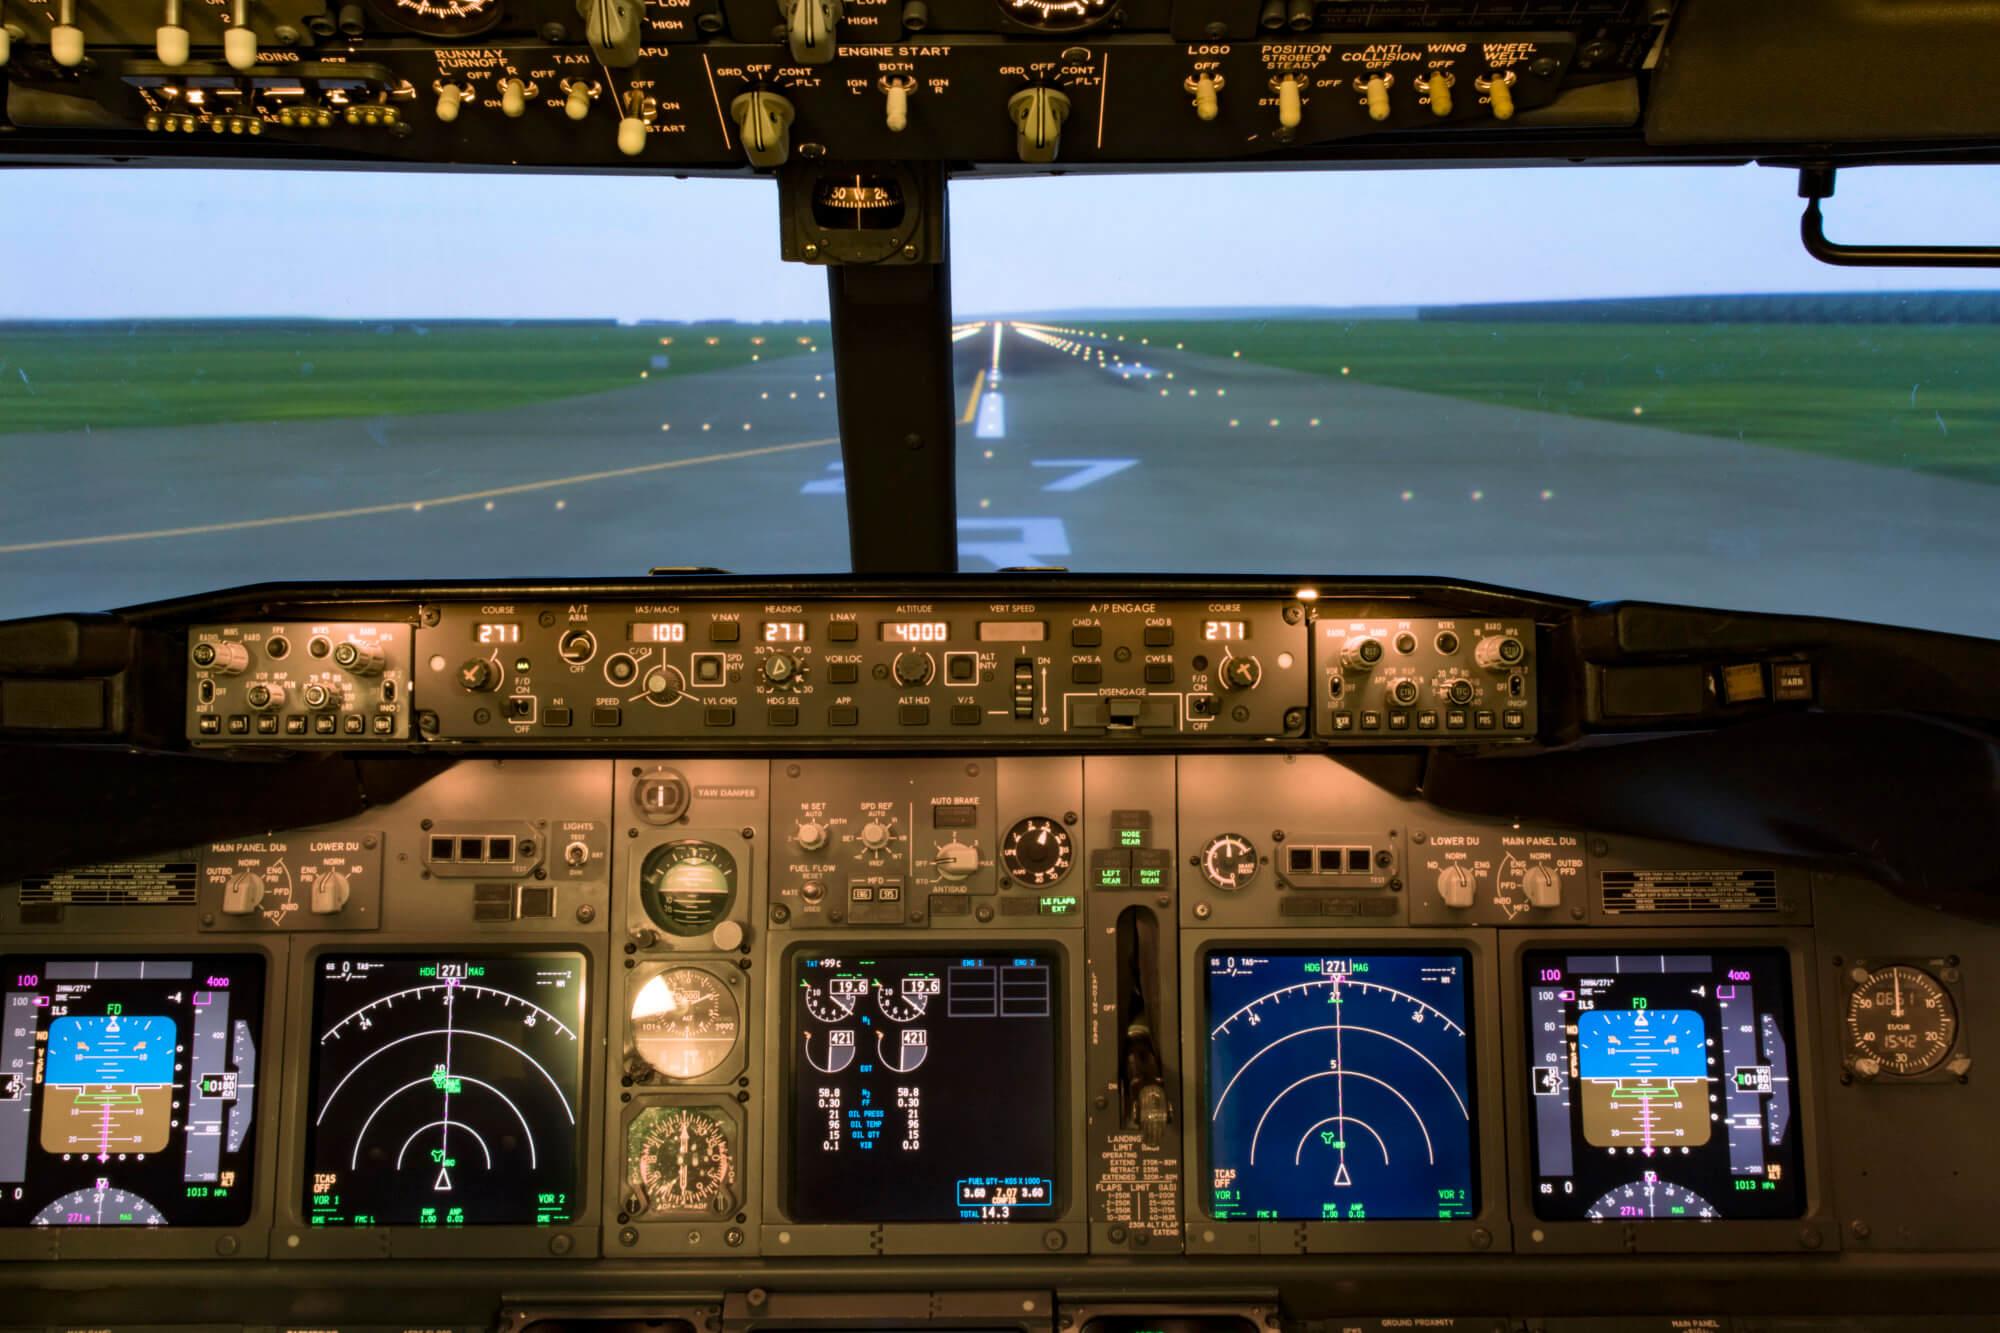 Flugsimulator